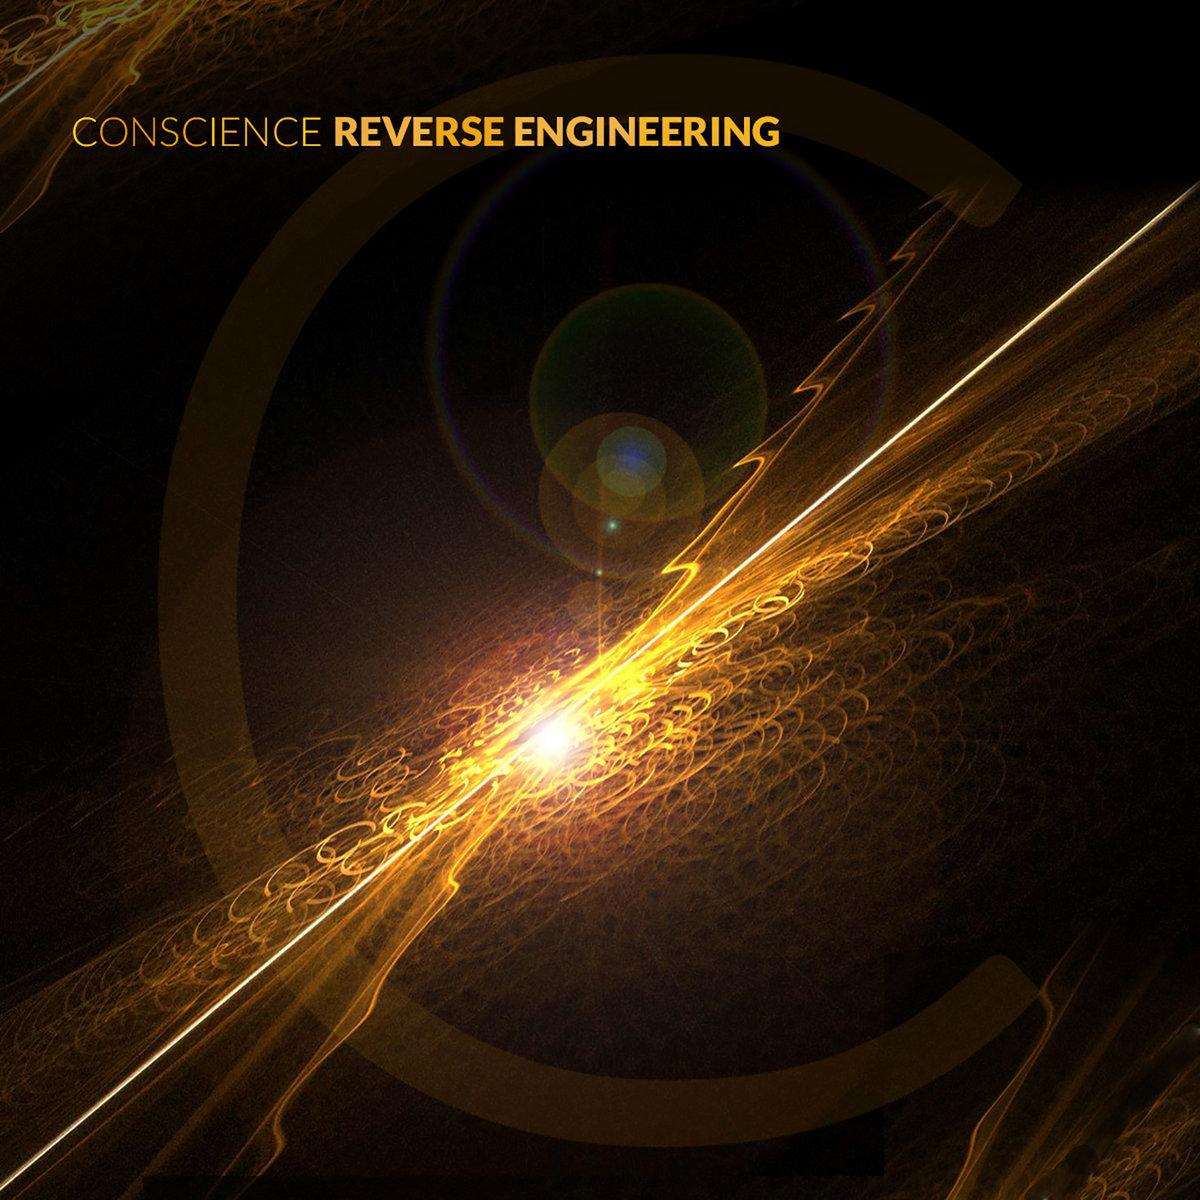 Reverse Engineering | Echozone